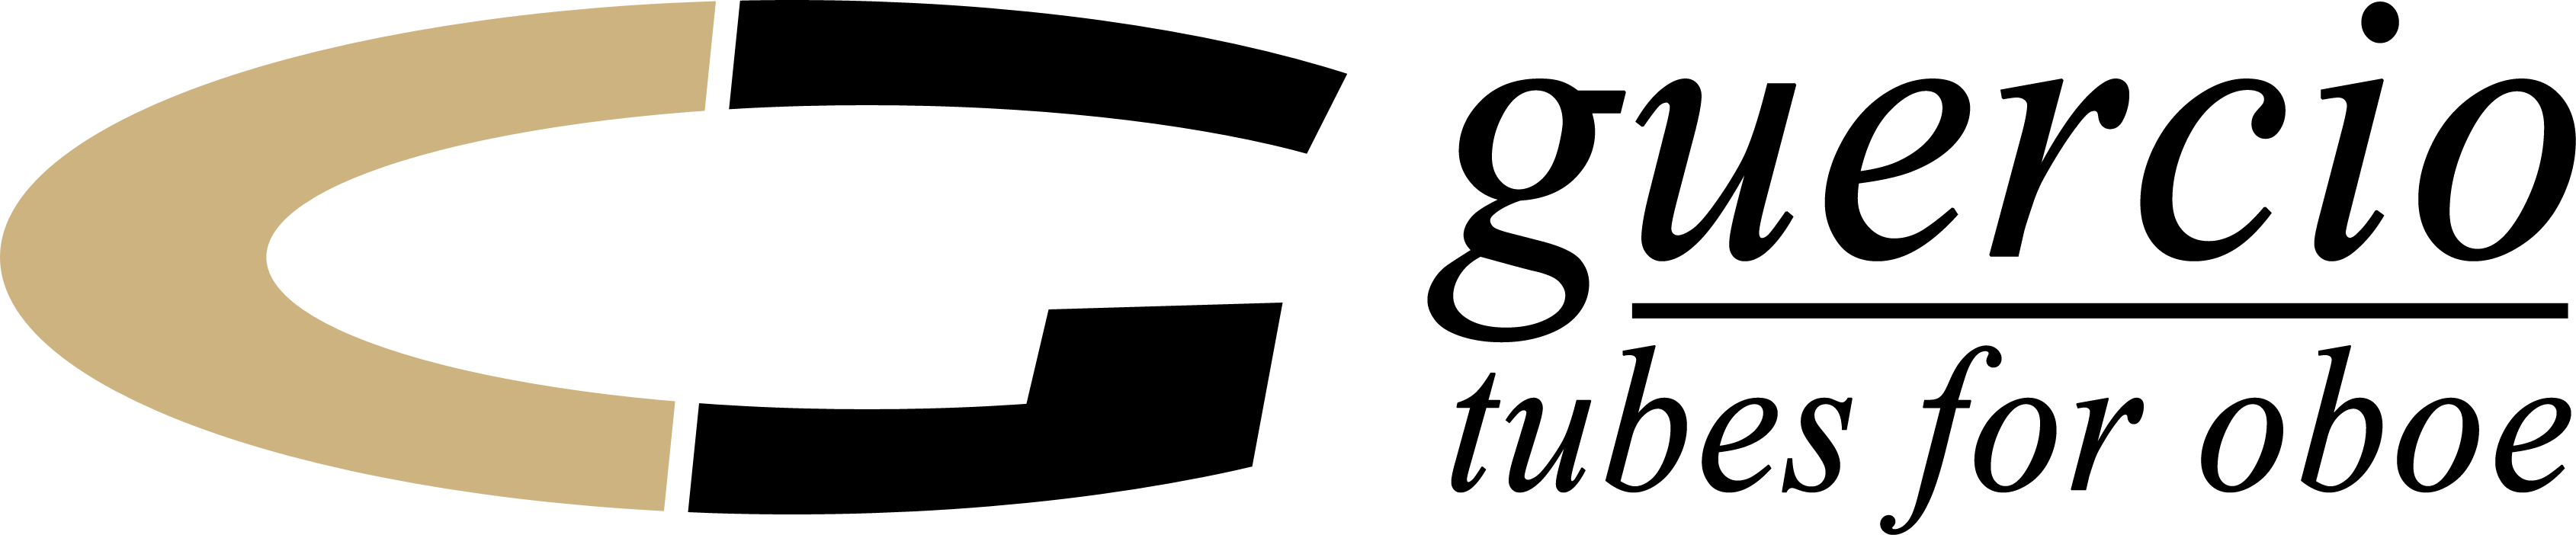 logo_vektor_tnr